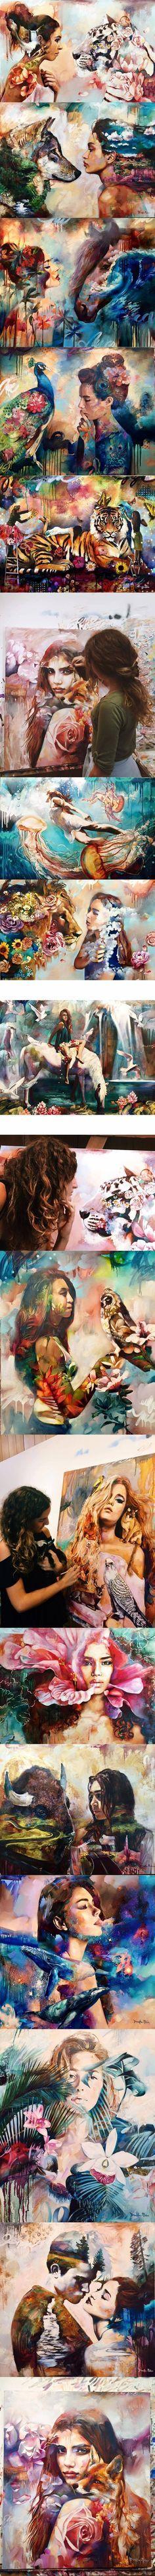 Dimitra Milan paintings reflect a dreamy world